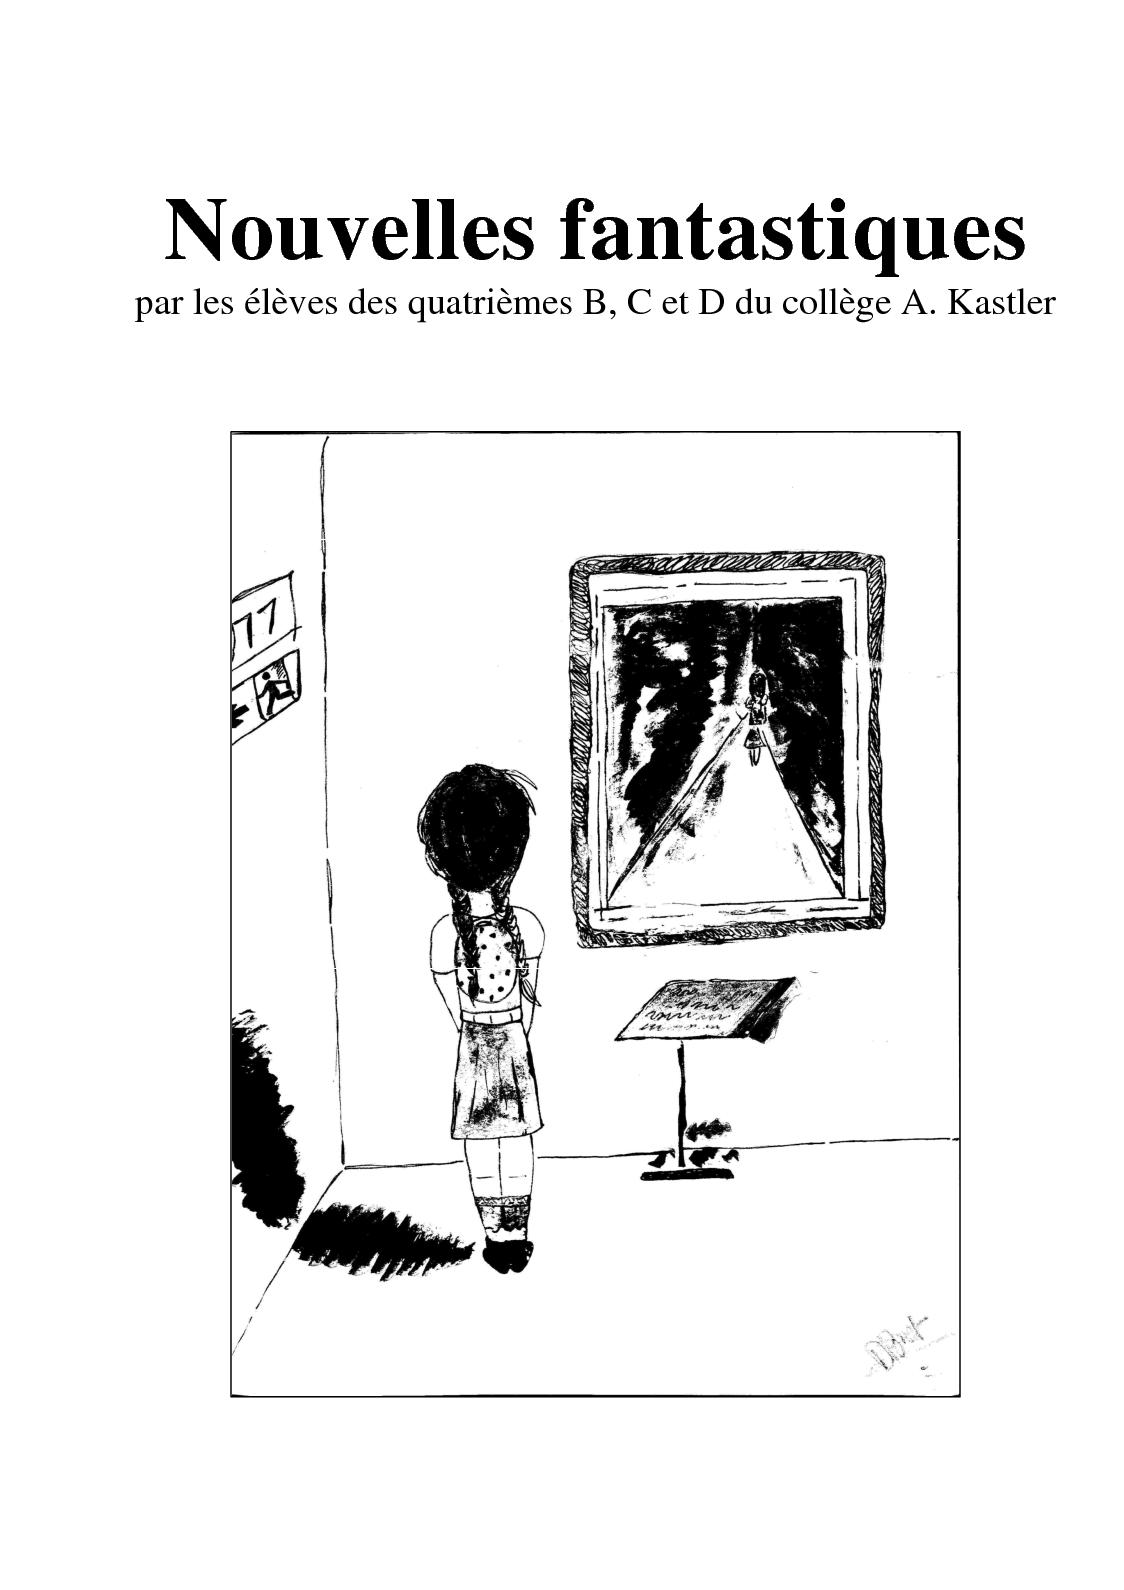 Calaméo Kastler Fantastiques Collège Alfred Nouvelles dxhstQrC